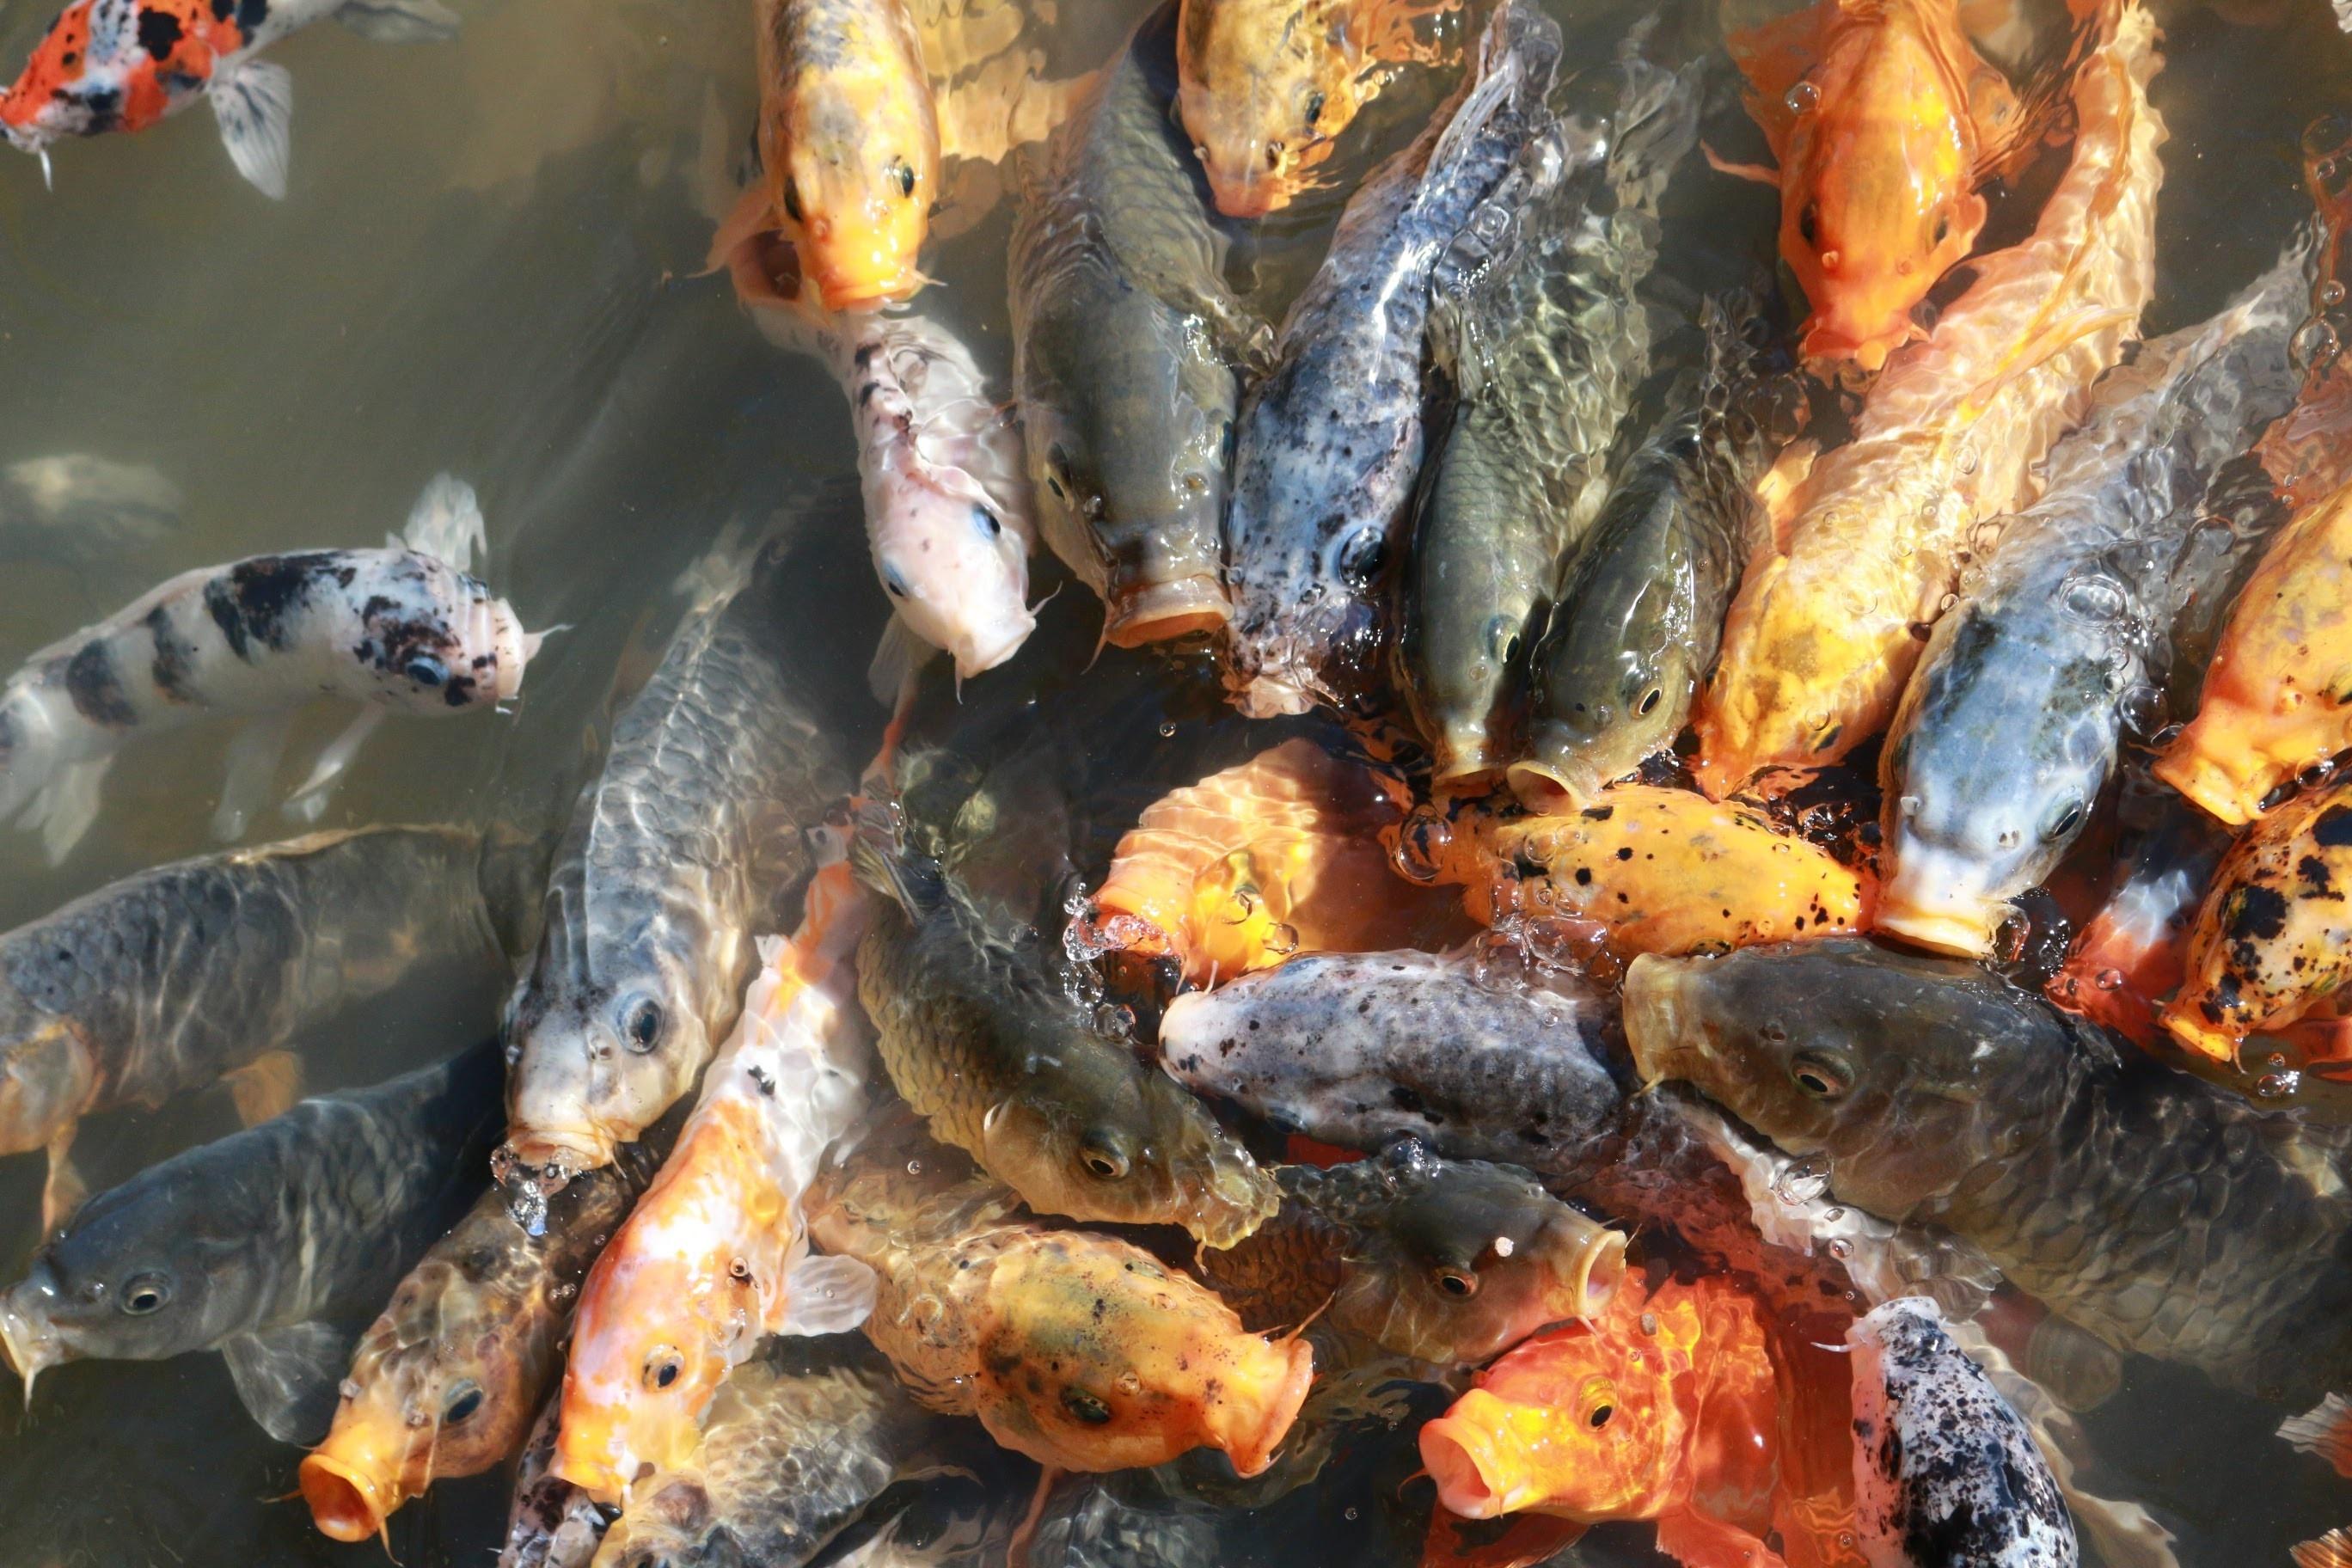 shoal of orange and gray koi fish